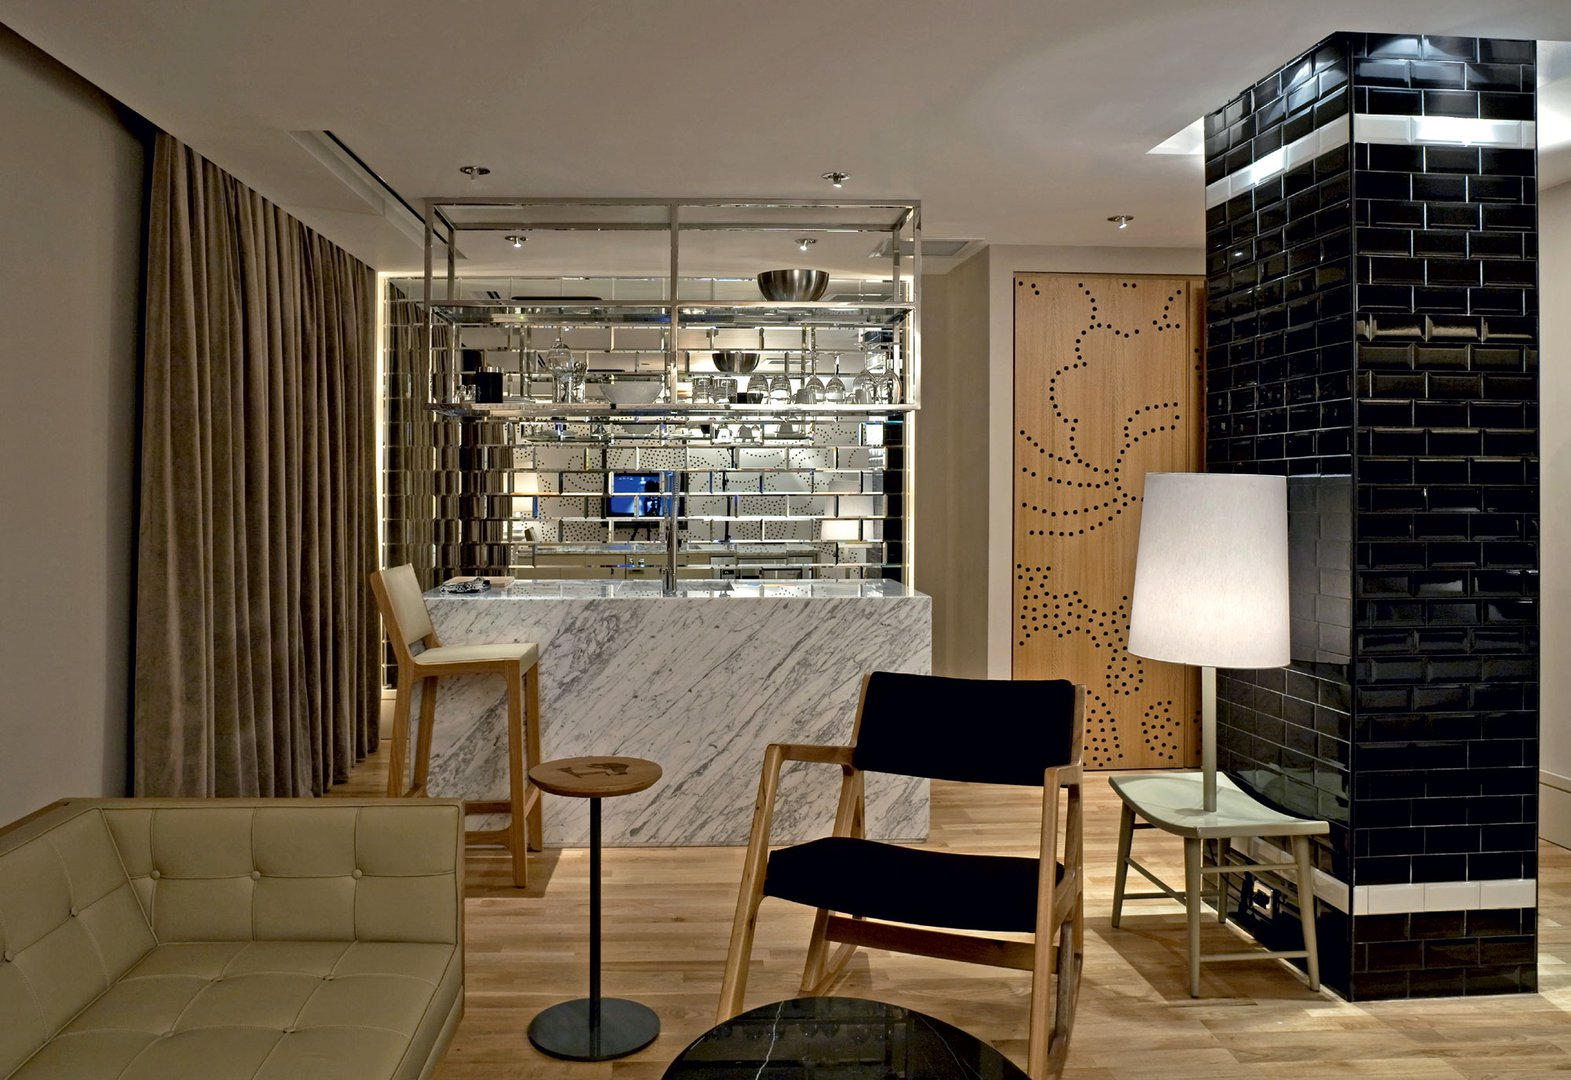 Hotel witt istanbul buti na oaza sredi velemesta dekor for Hotel dekor istanbul